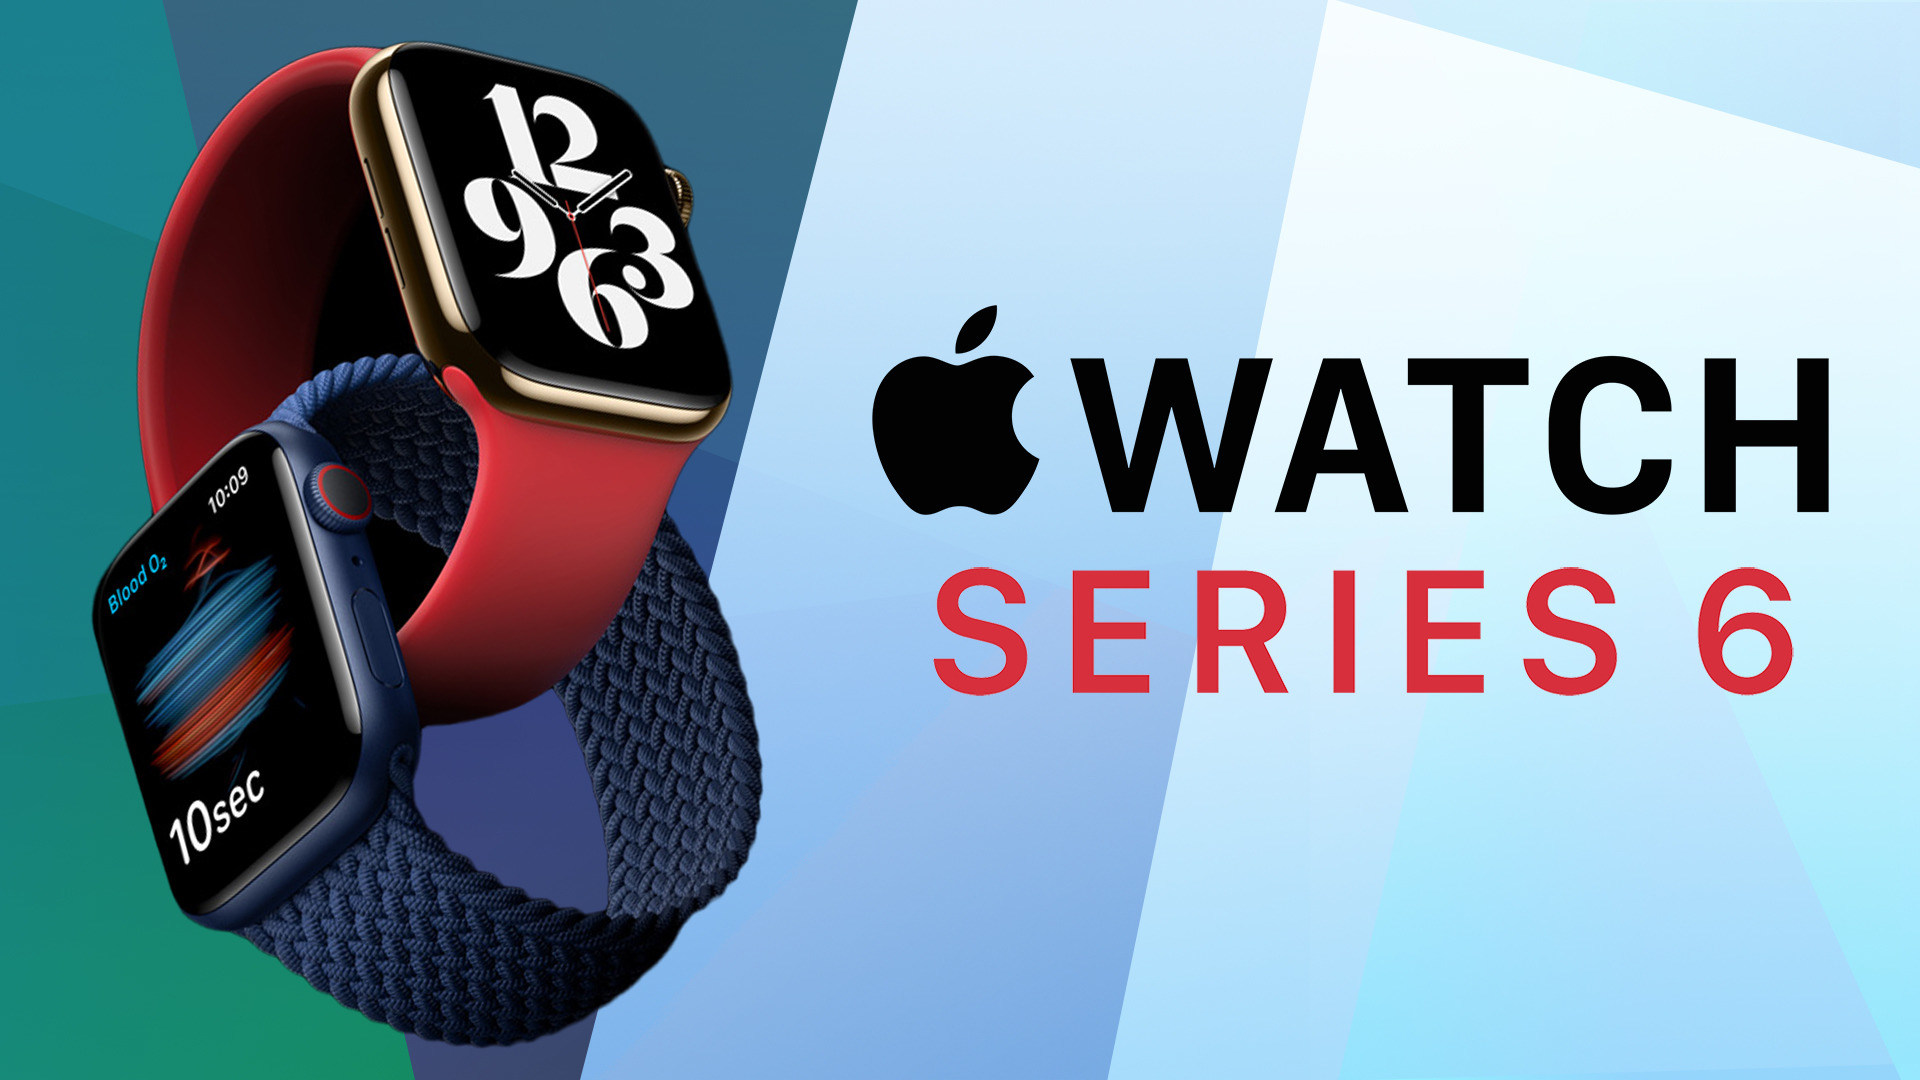 Apple, smartwatch, Uhr, Wearables, Apple Watch, Apple Watch Series 6, Series 6